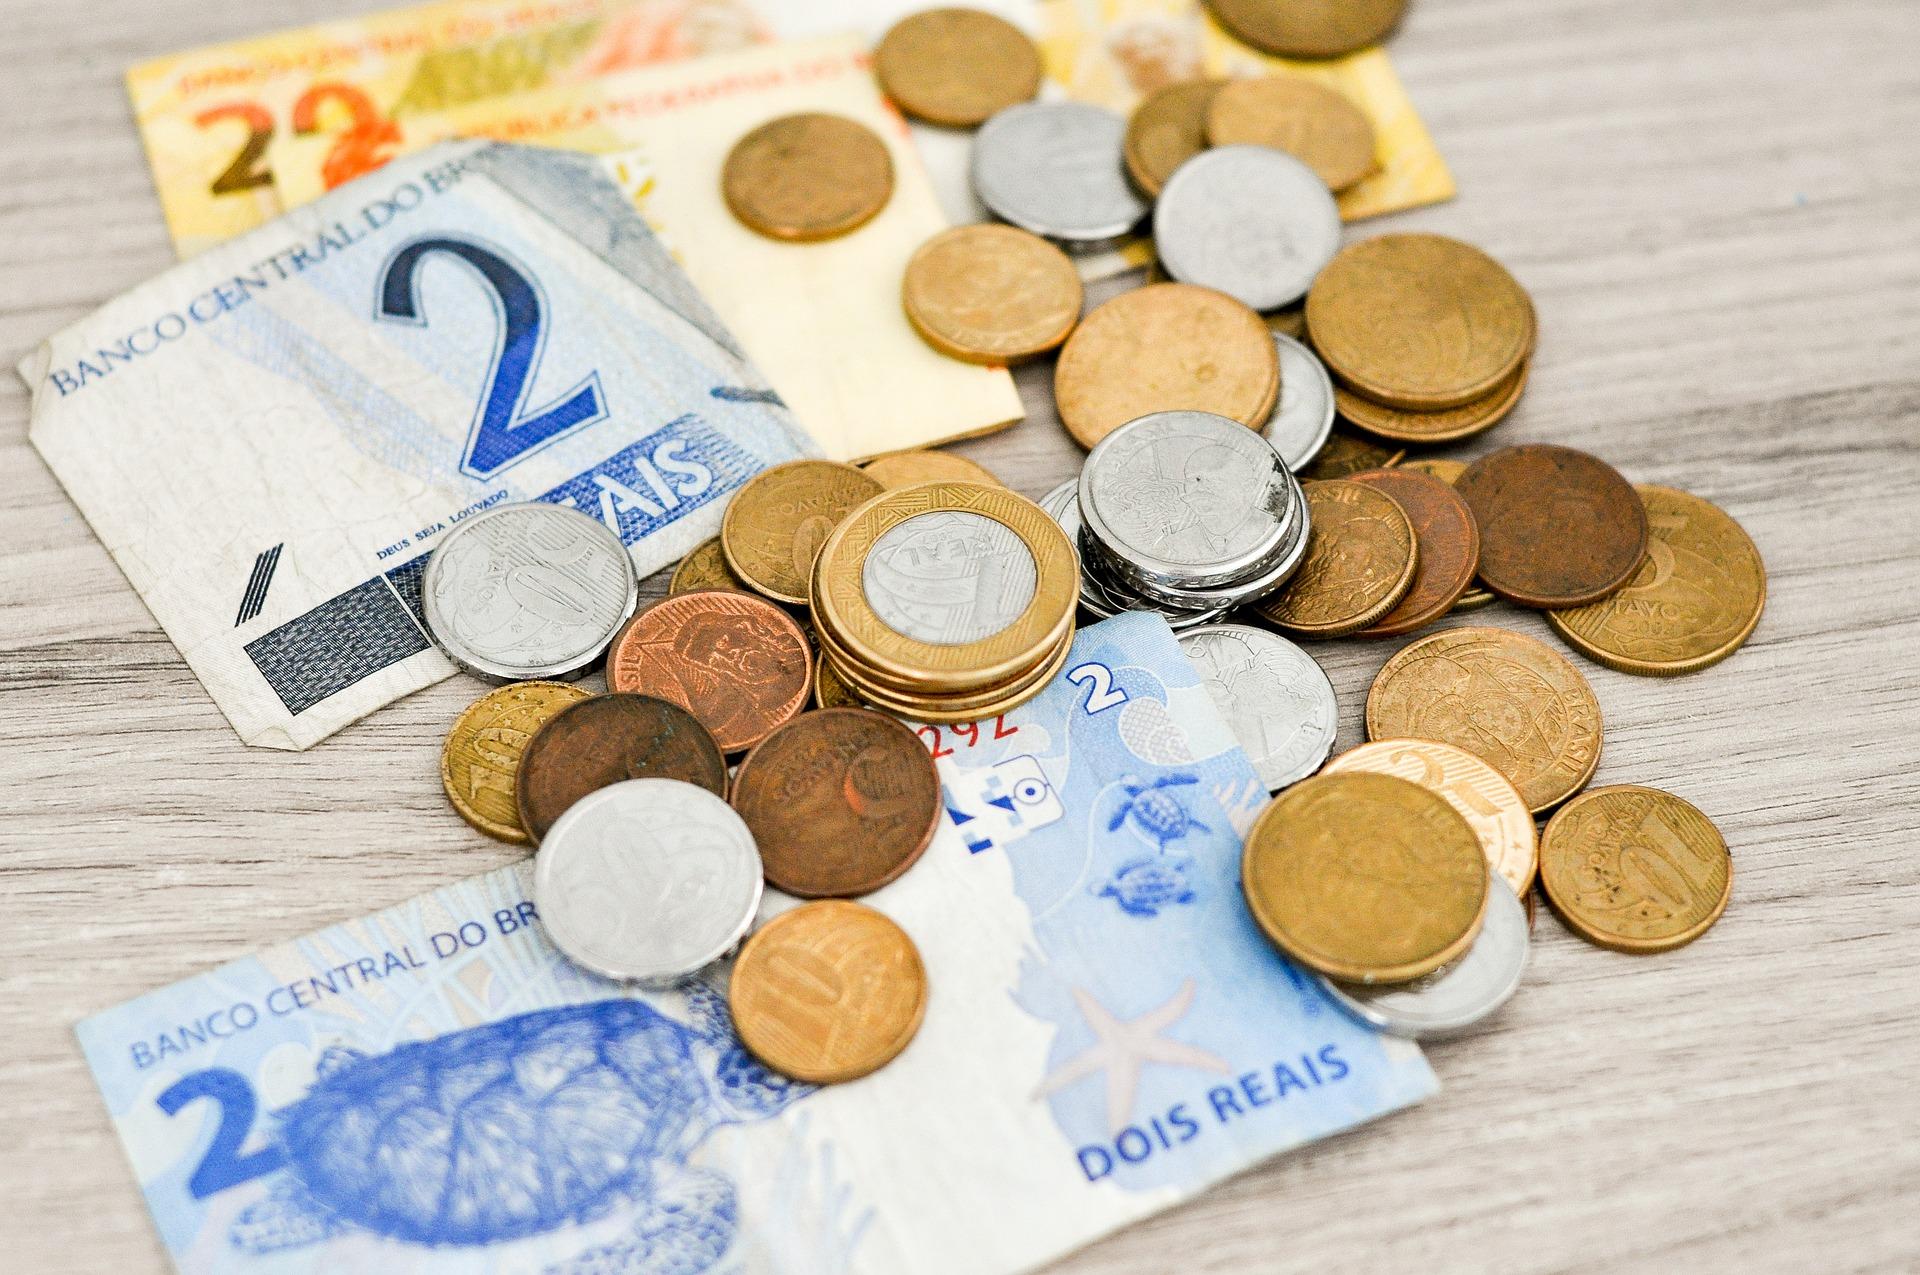 dinheiro real brasil feirao limpa nome serasa